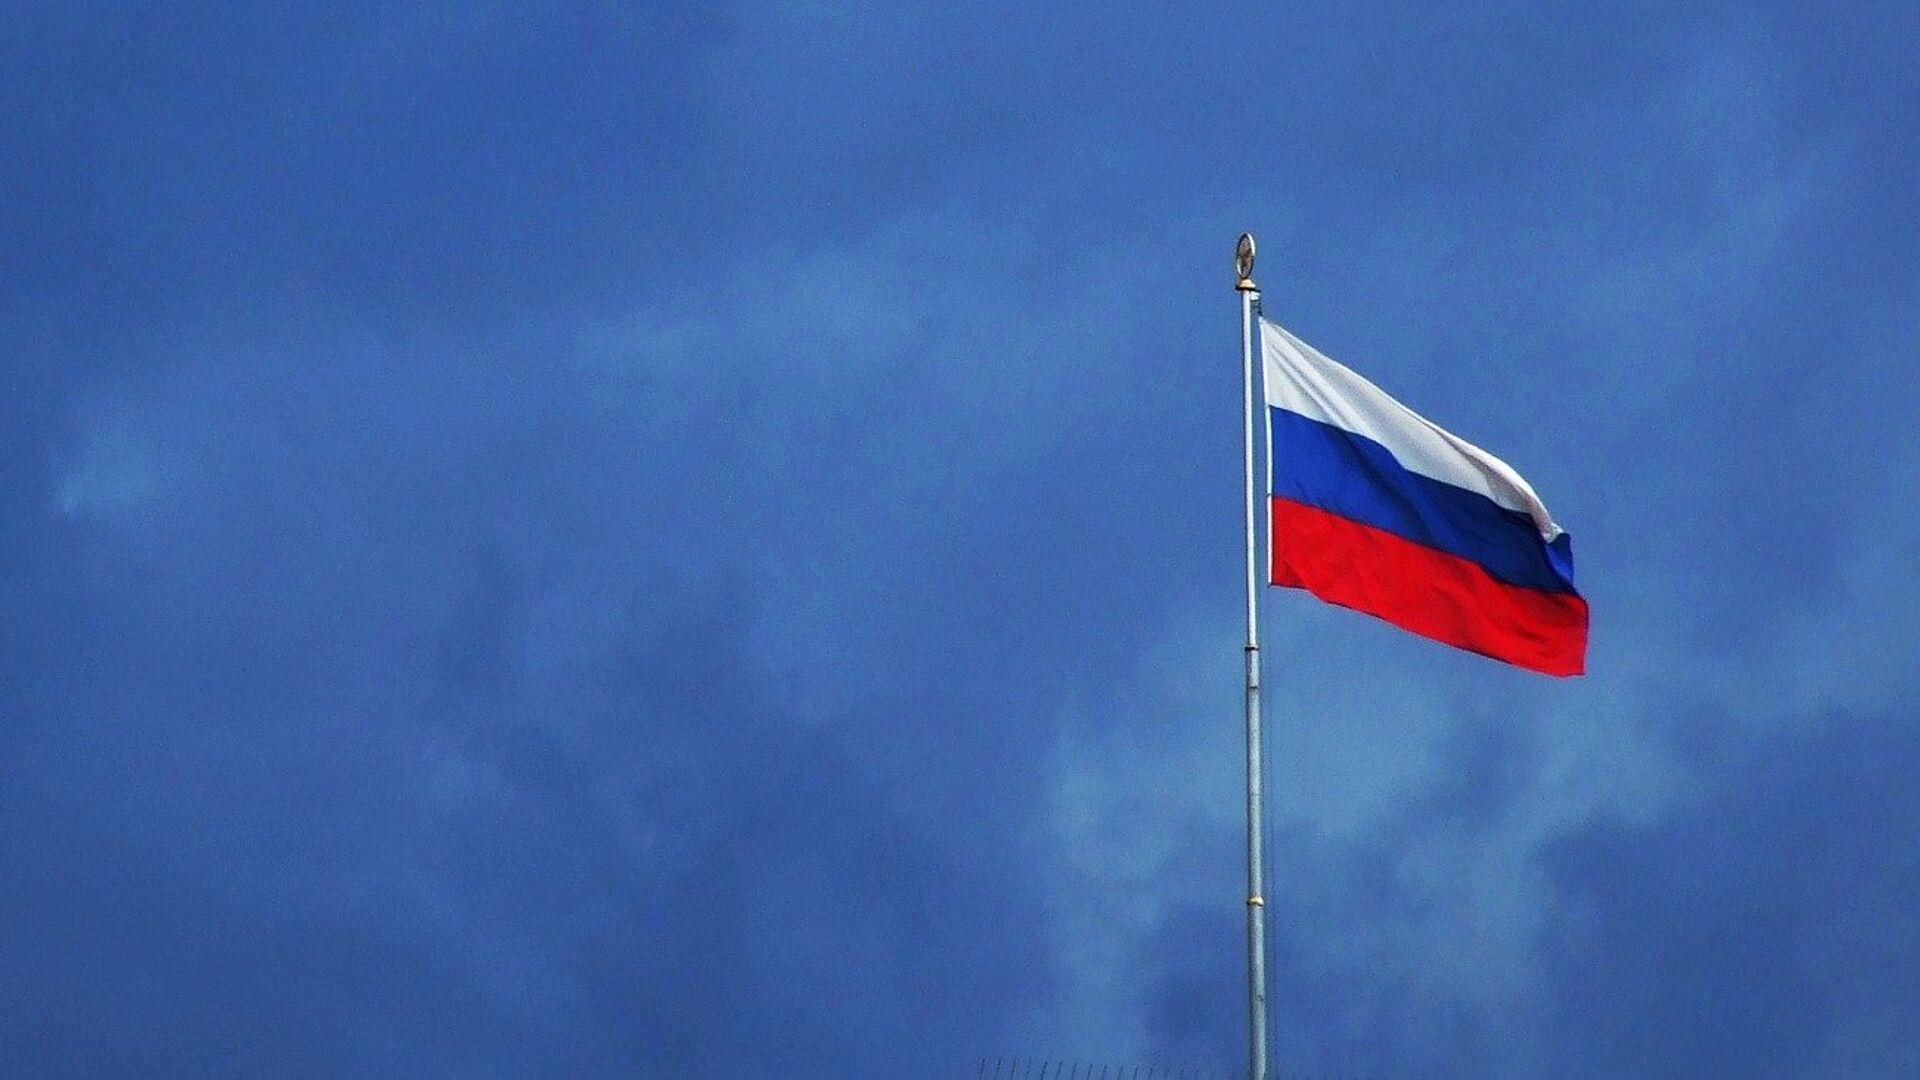 Bandera de Rusia - Sputnik Mundo, 1920, 08.02.2021